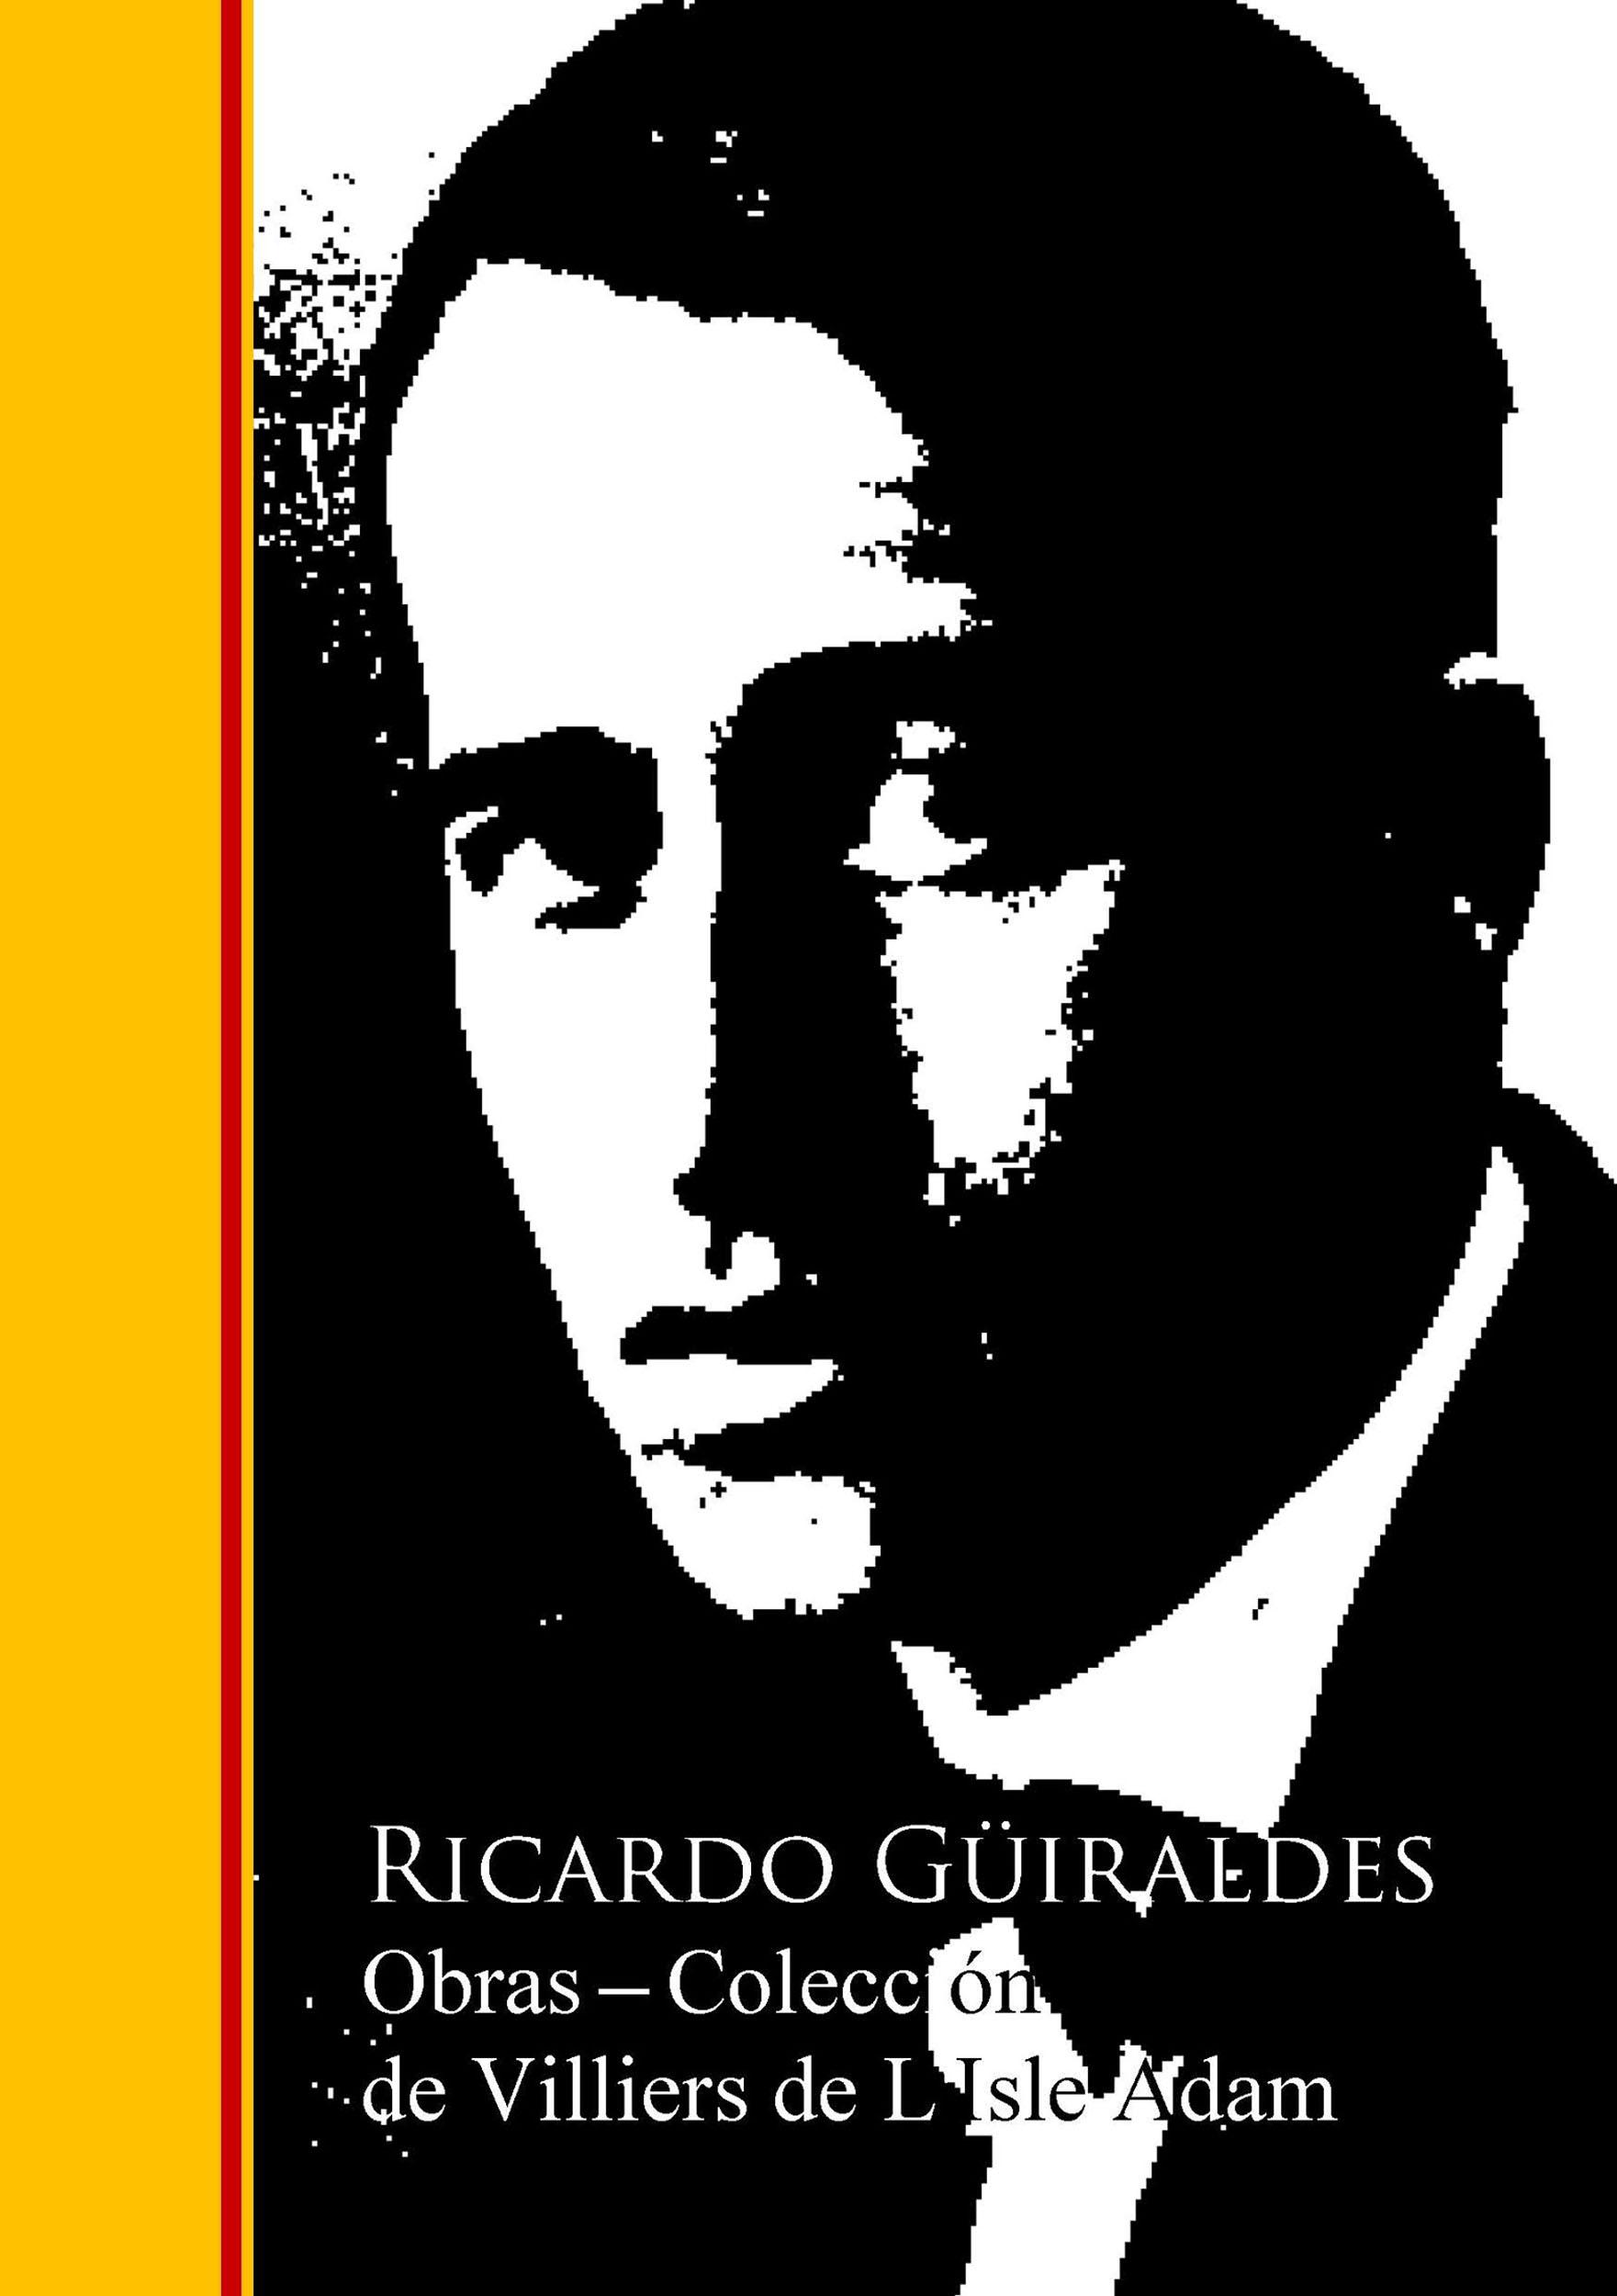 Ricardo Guiraldes Obras - Coleccion de Ricardo Guira недорого